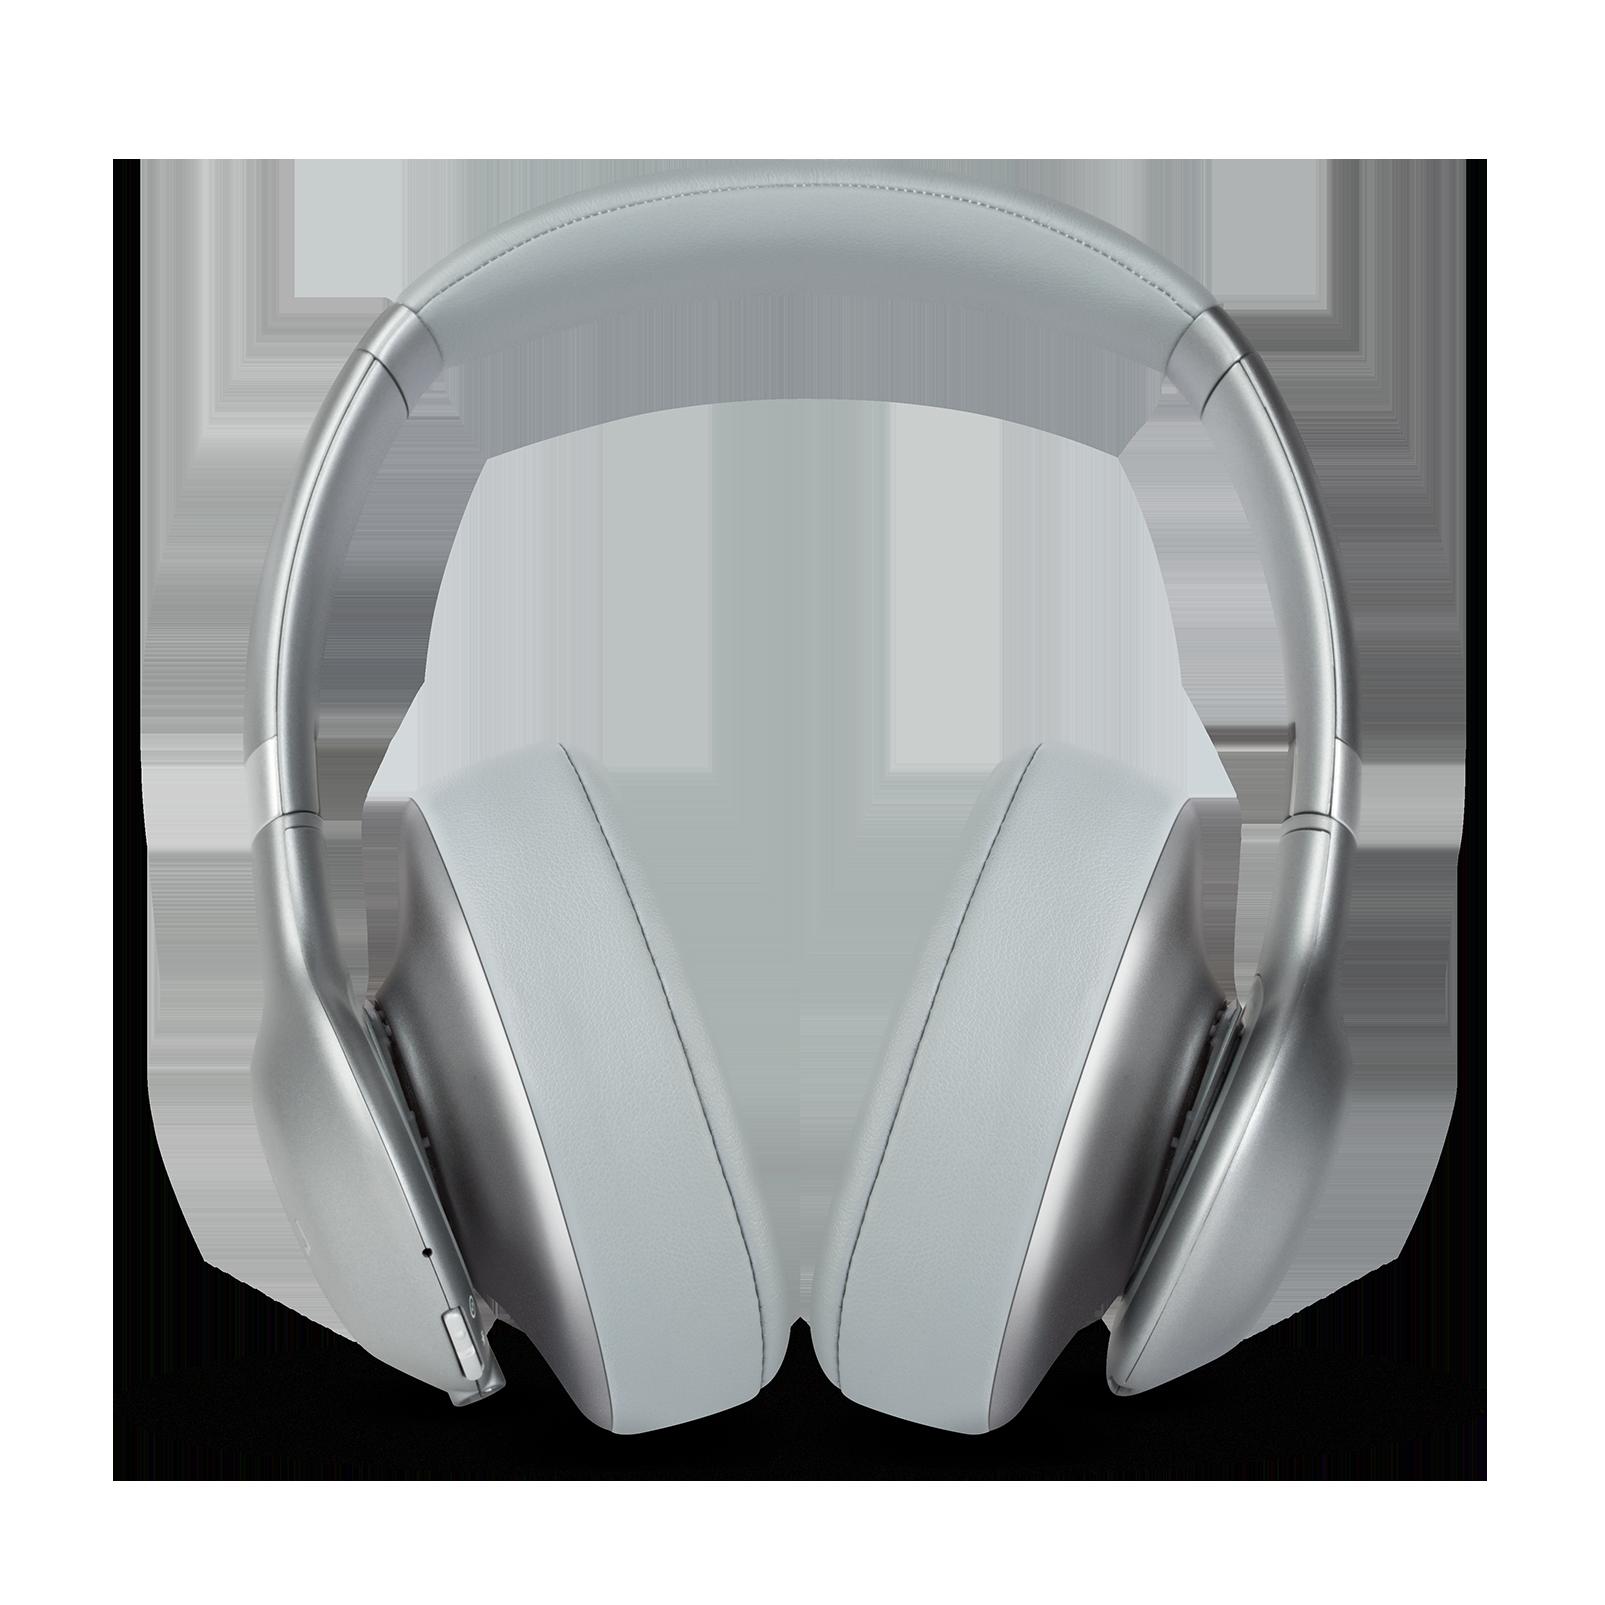 JBL EVEREST™ 710GA - Silver - Wireless over-ear headphones - Front